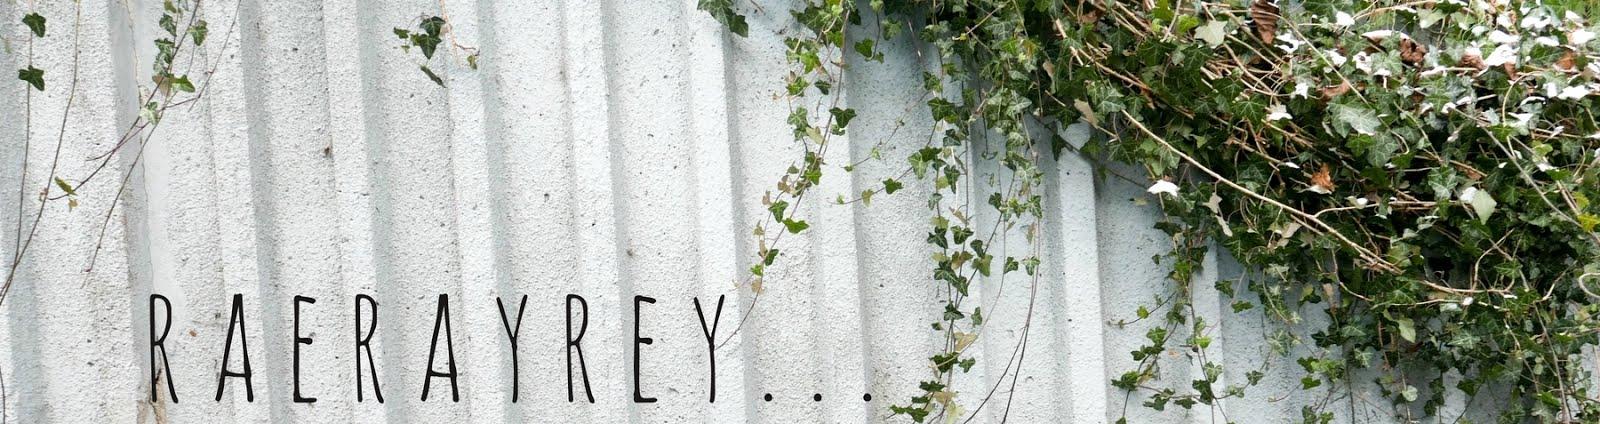 Raerayrey